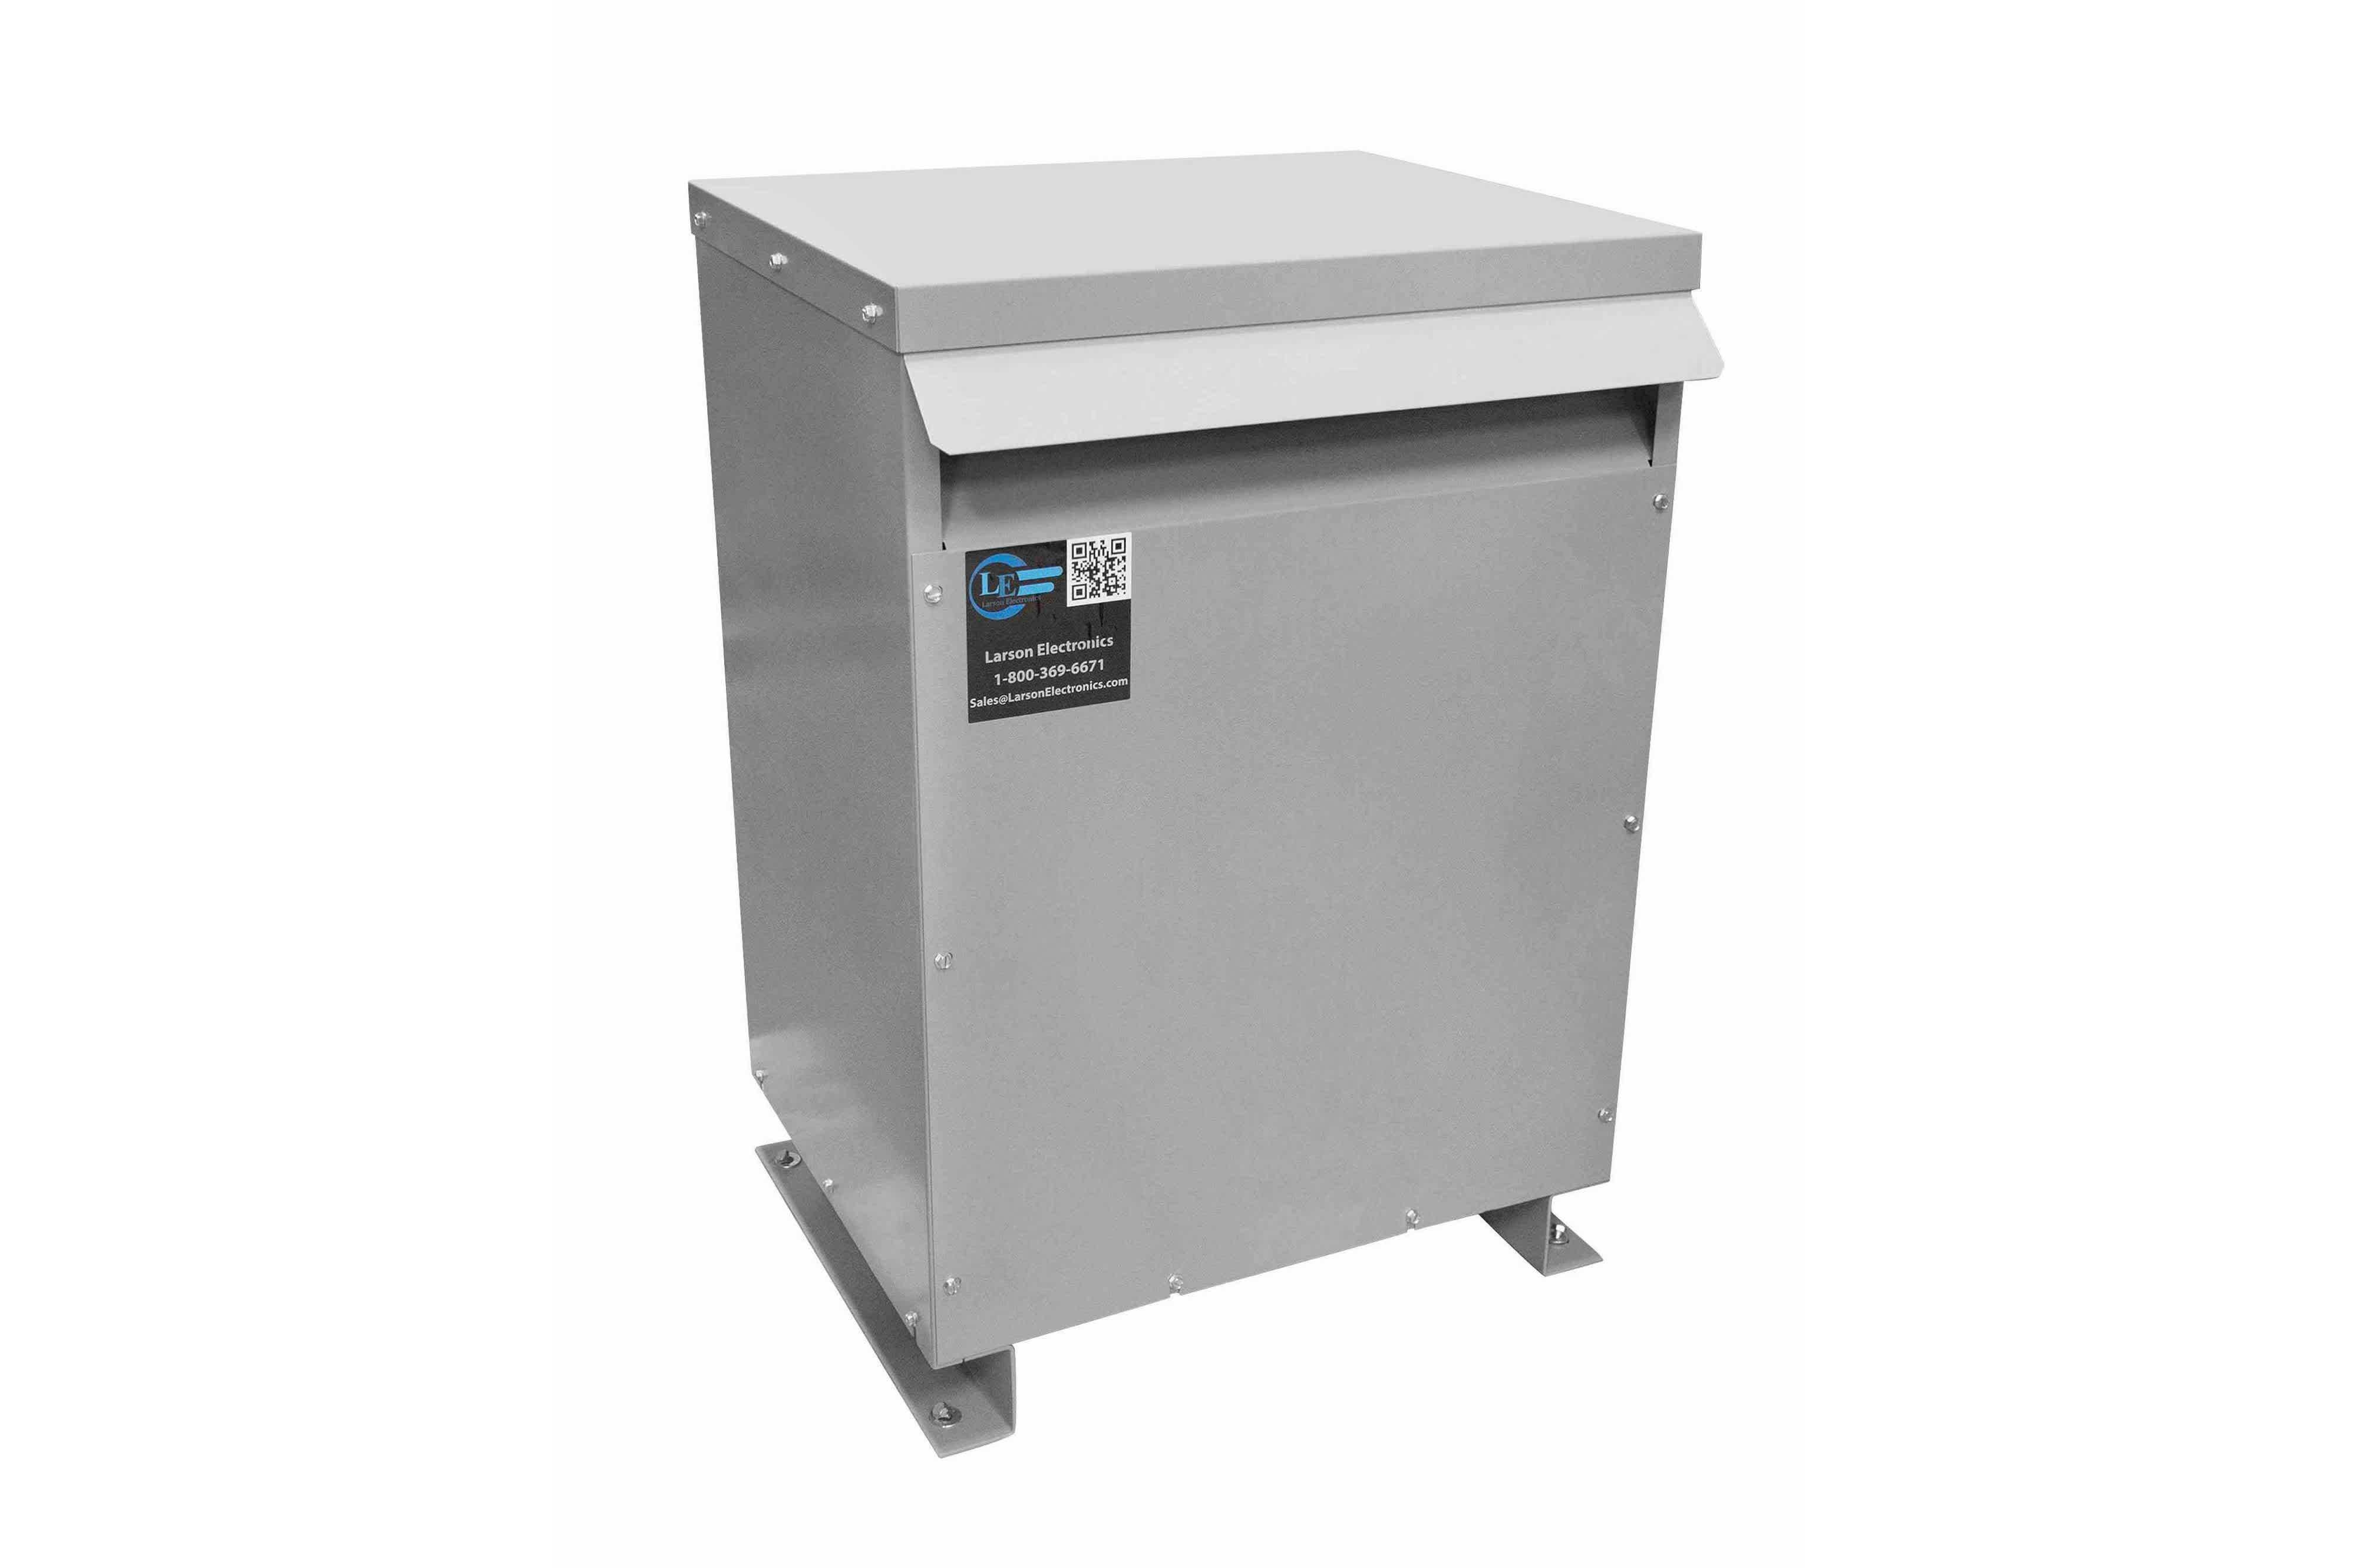 32.5 kVA 3PH Isolation Transformer, 440V Wye Primary, 240V/120 Delta Secondary, N3R, Ventilated, 60 Hz